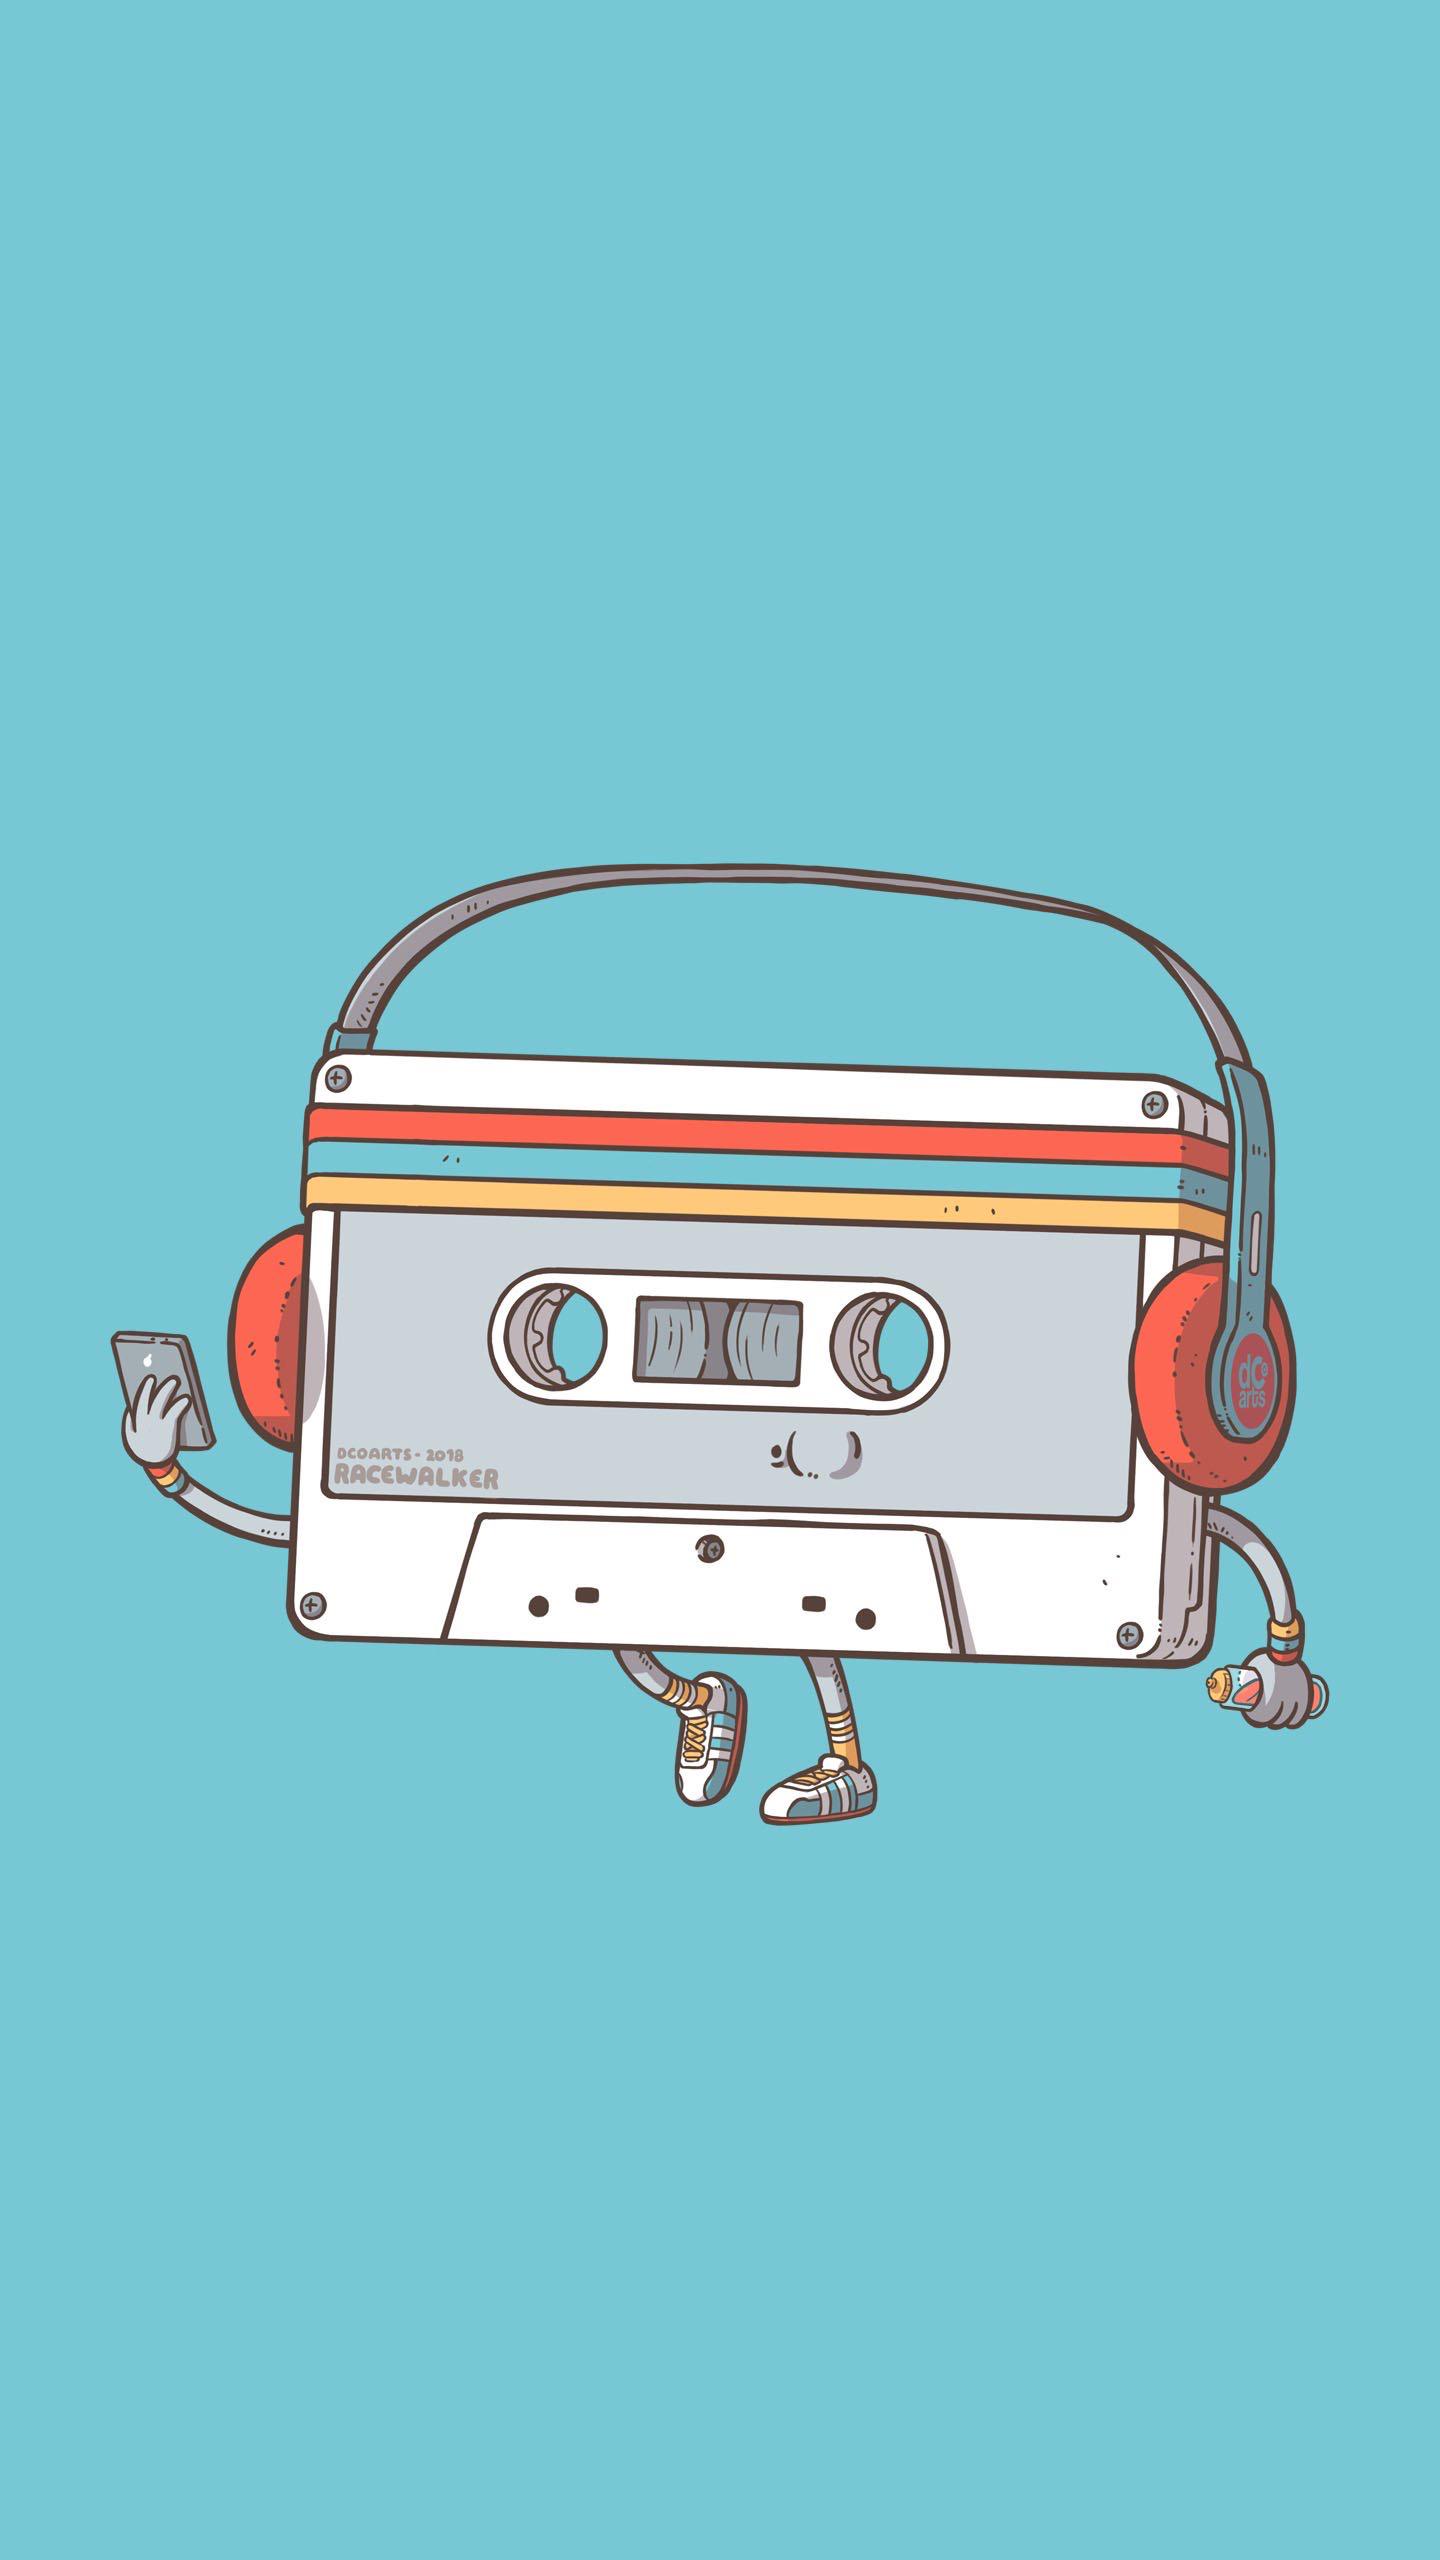 General 1440x2560 vertical digital art simple background smartphone headphones tape audio cassete music blue background